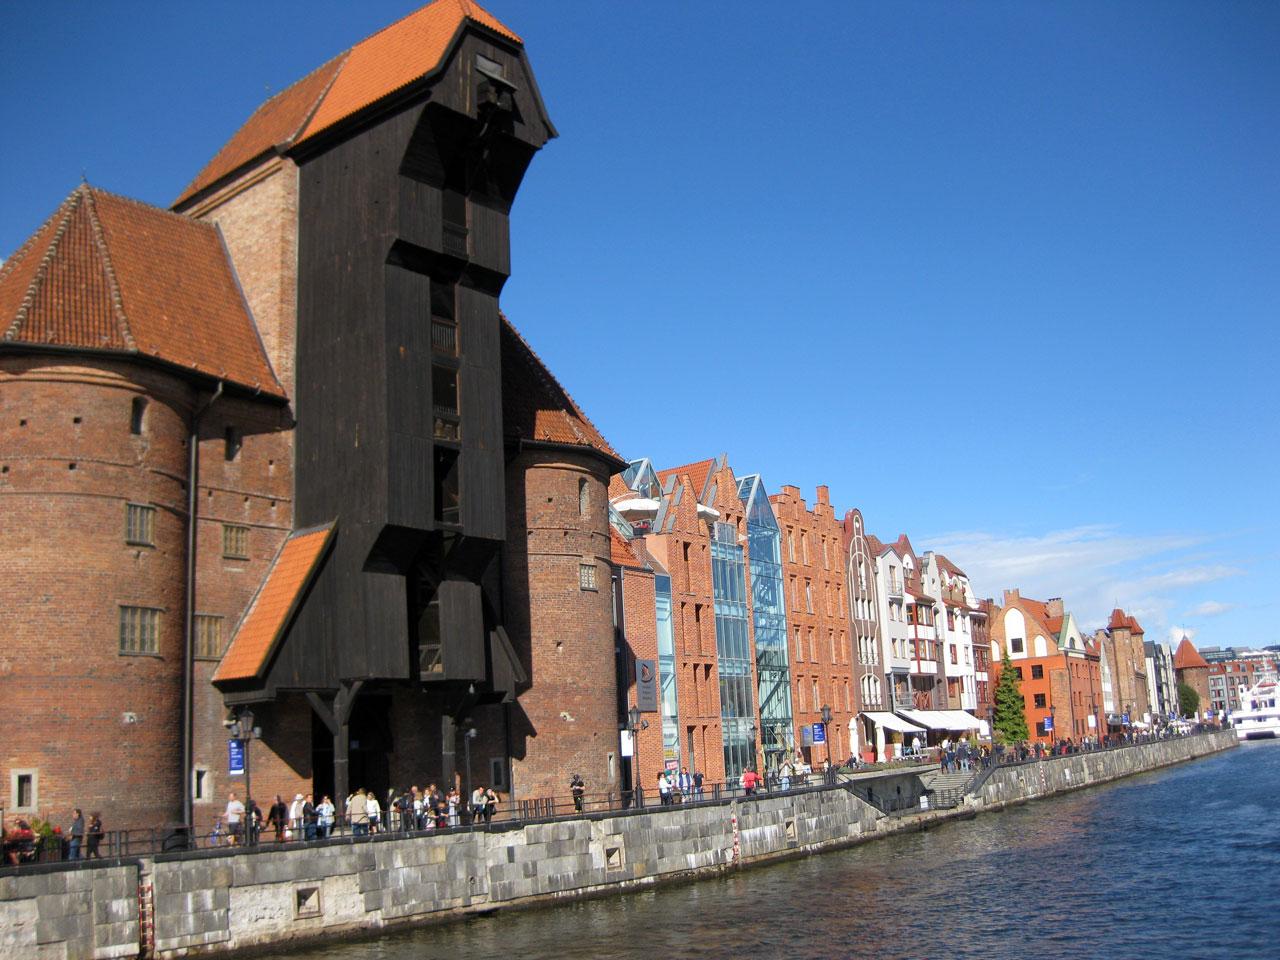 The Gdańsk Crane